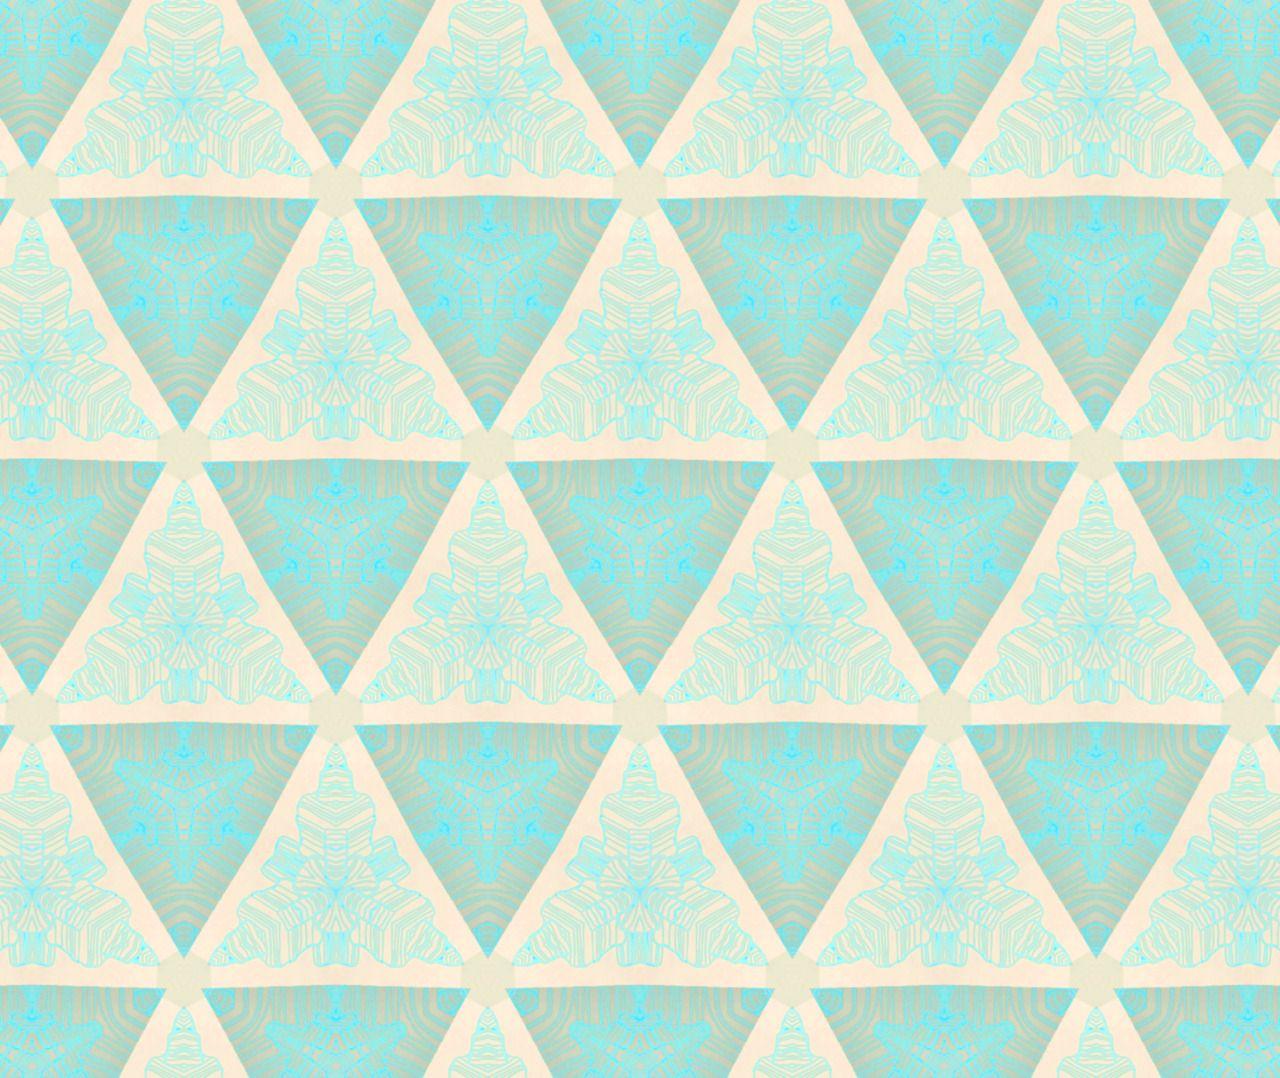 patterns tumblr - Pesquisa Google | Patterns | Pinterest for Background Pattern Tumblr Green  66plt